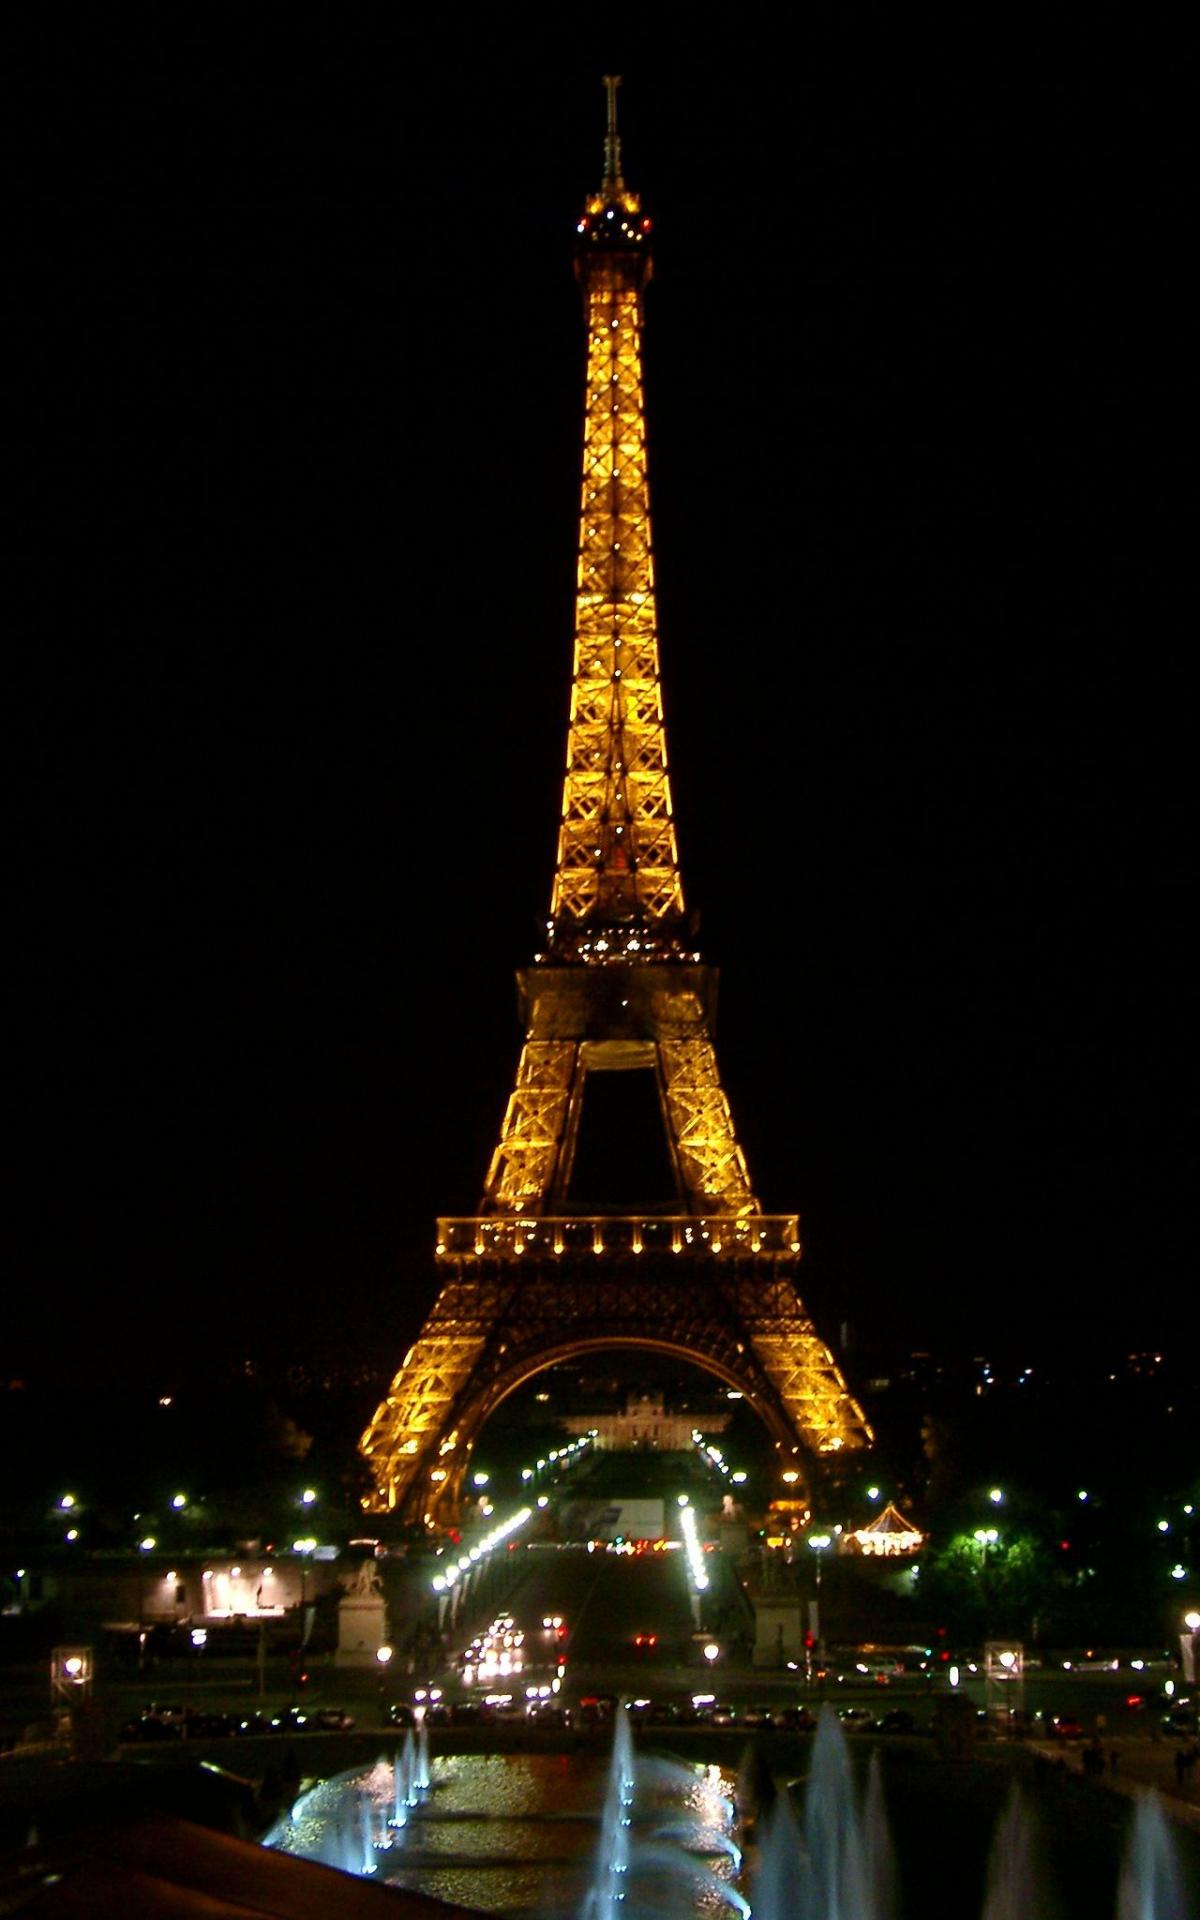 Free Download Iphone S C Eiffel Tower Wallpapers Hd Desktop Paris France 1536x2048 For Your Desktop Mobile Tablet Explore 30 Paris France Eiffel Tower Wallpapers Eiffel Tower Paris France